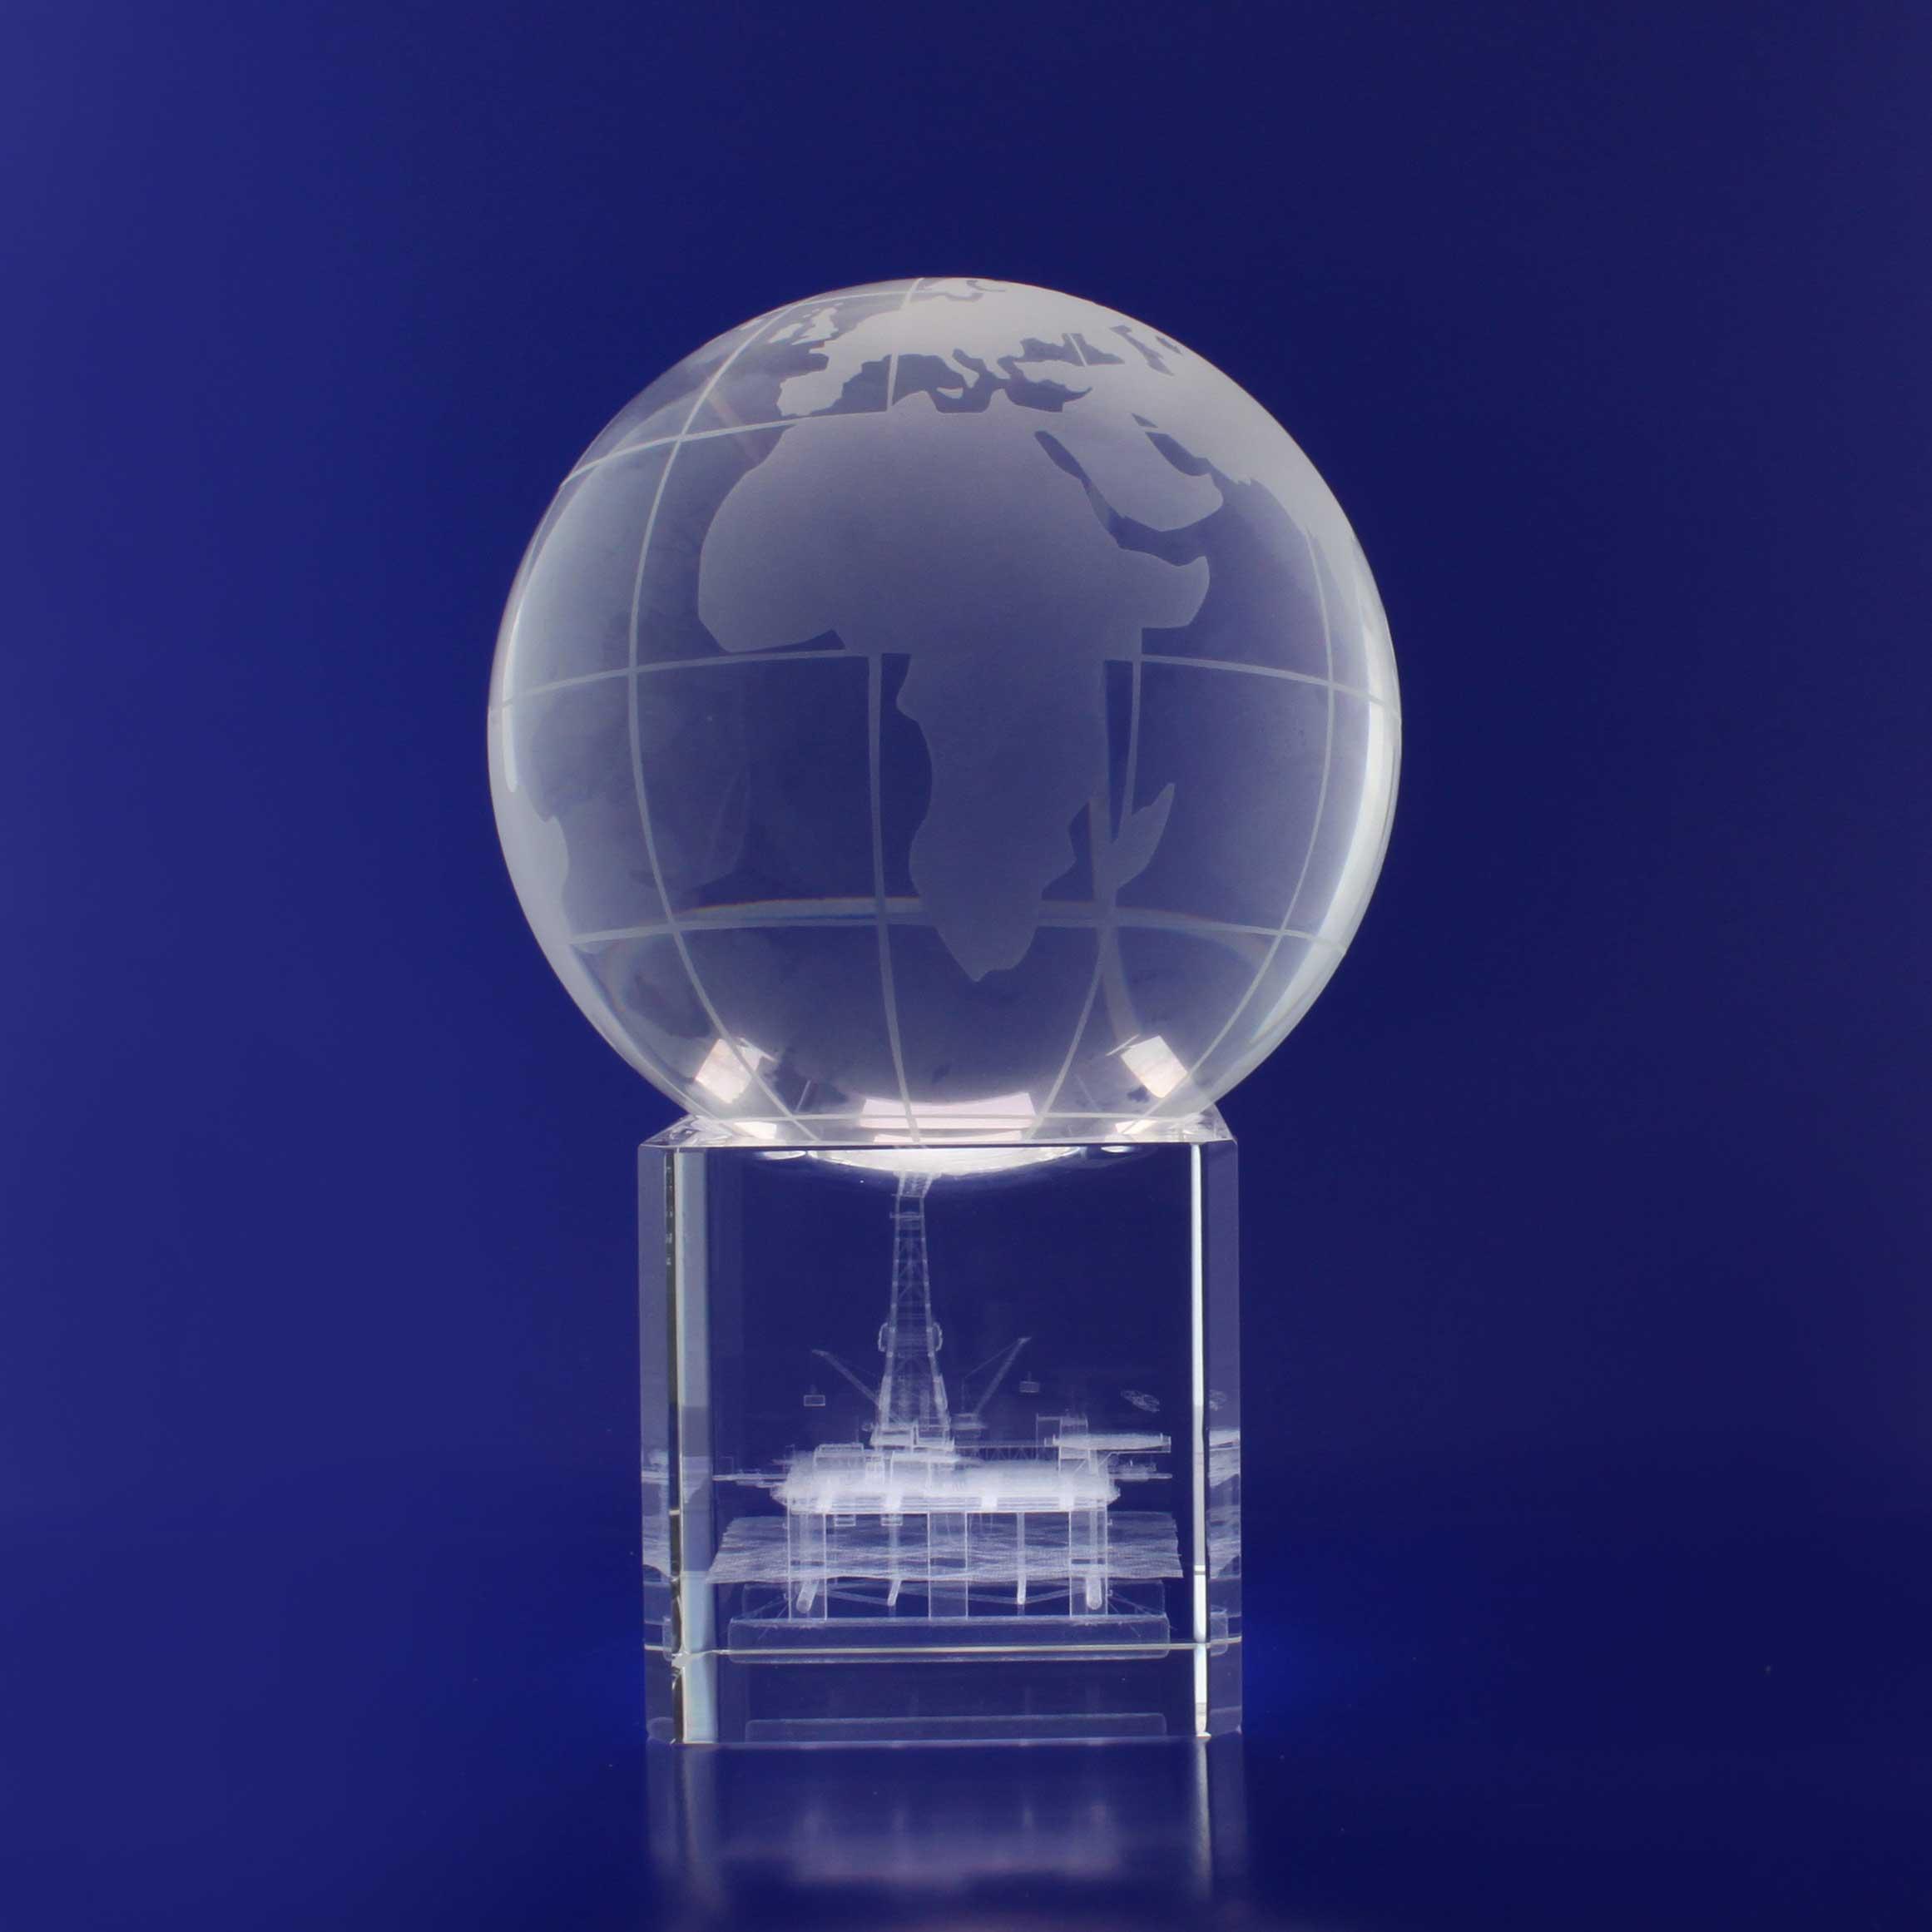 3D Crystal - Spinning Globe